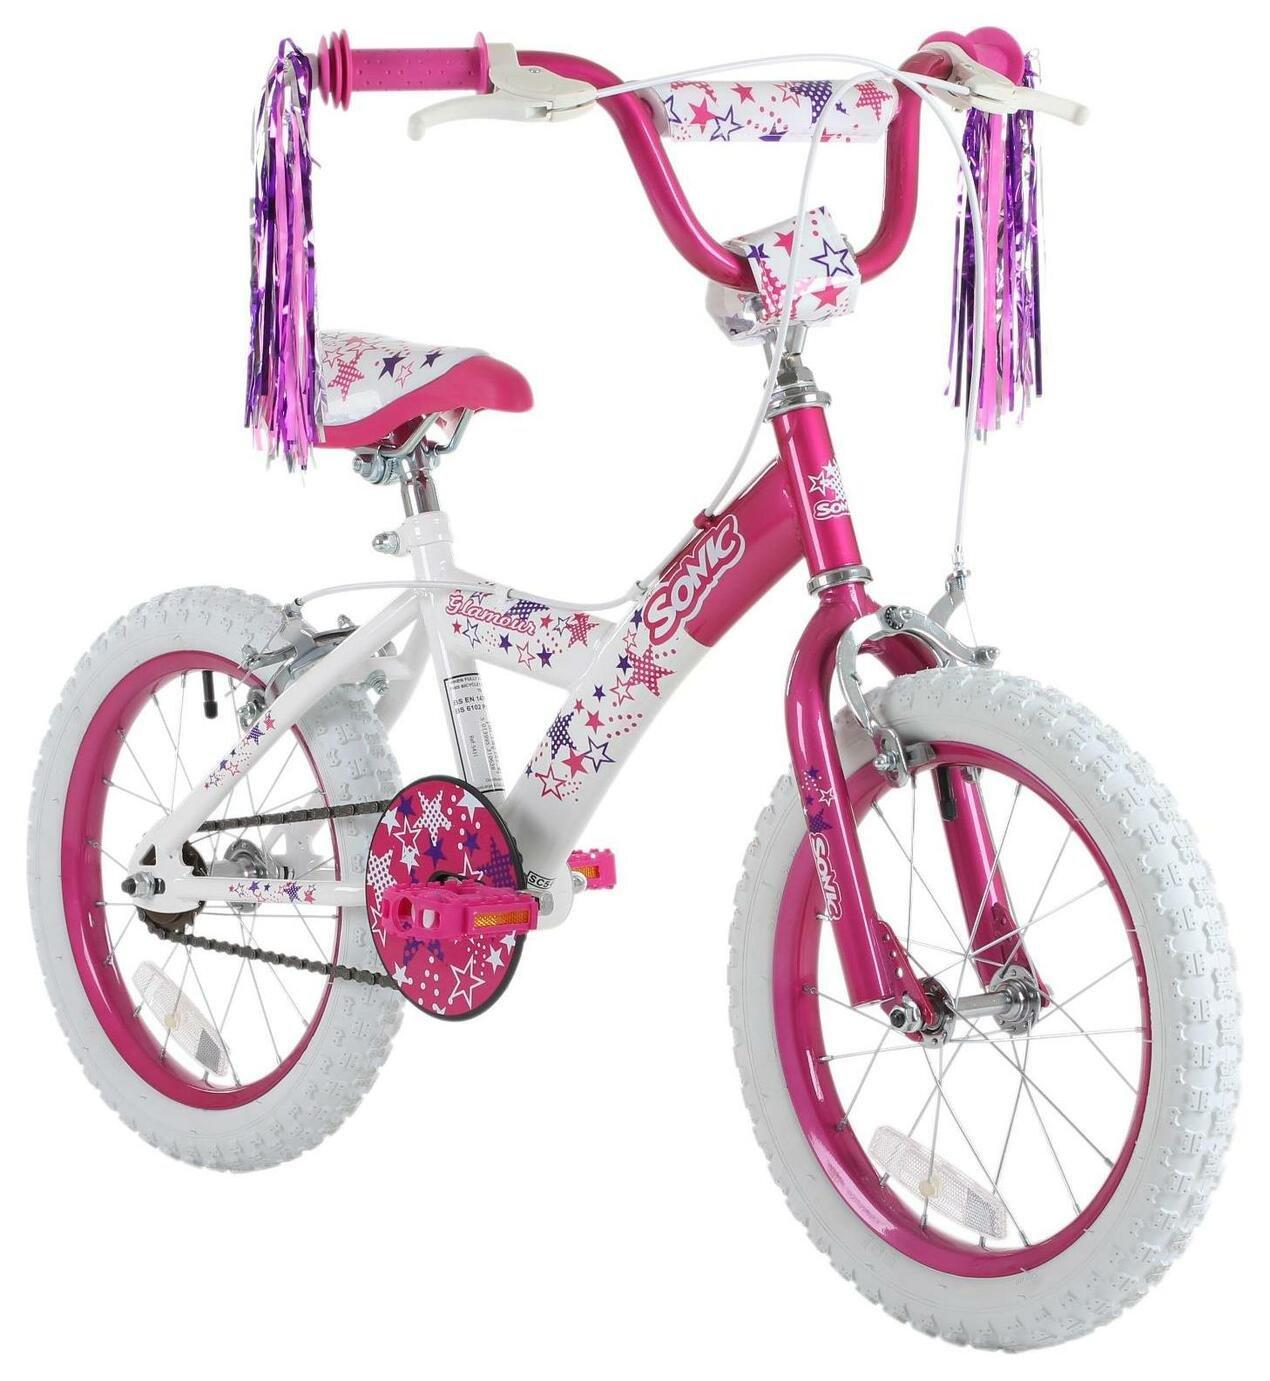 Sonic Glamour 16 Inch Kids Bike